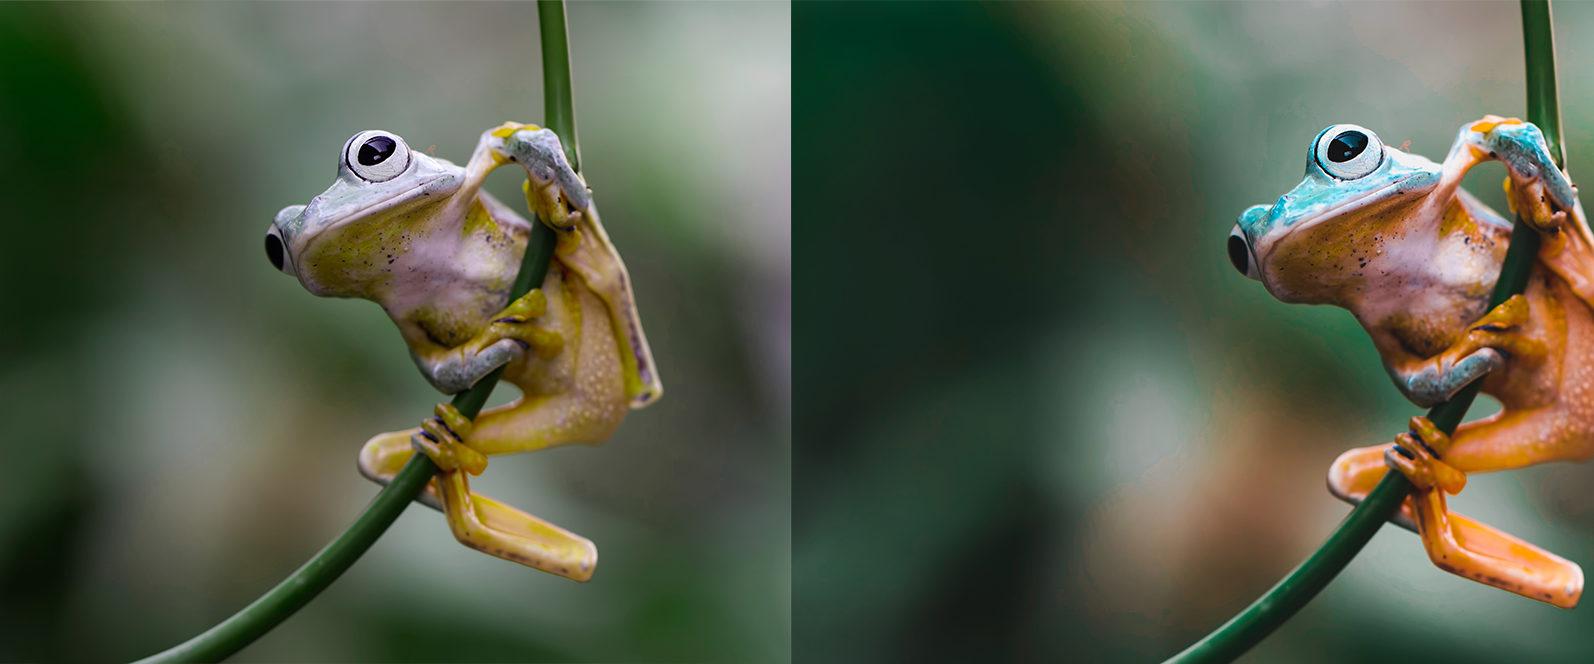 10 x Rain Forest Lightroom Presets | Green Lightroom Presets | Nature Presets - Rain Forest Preview 5 -